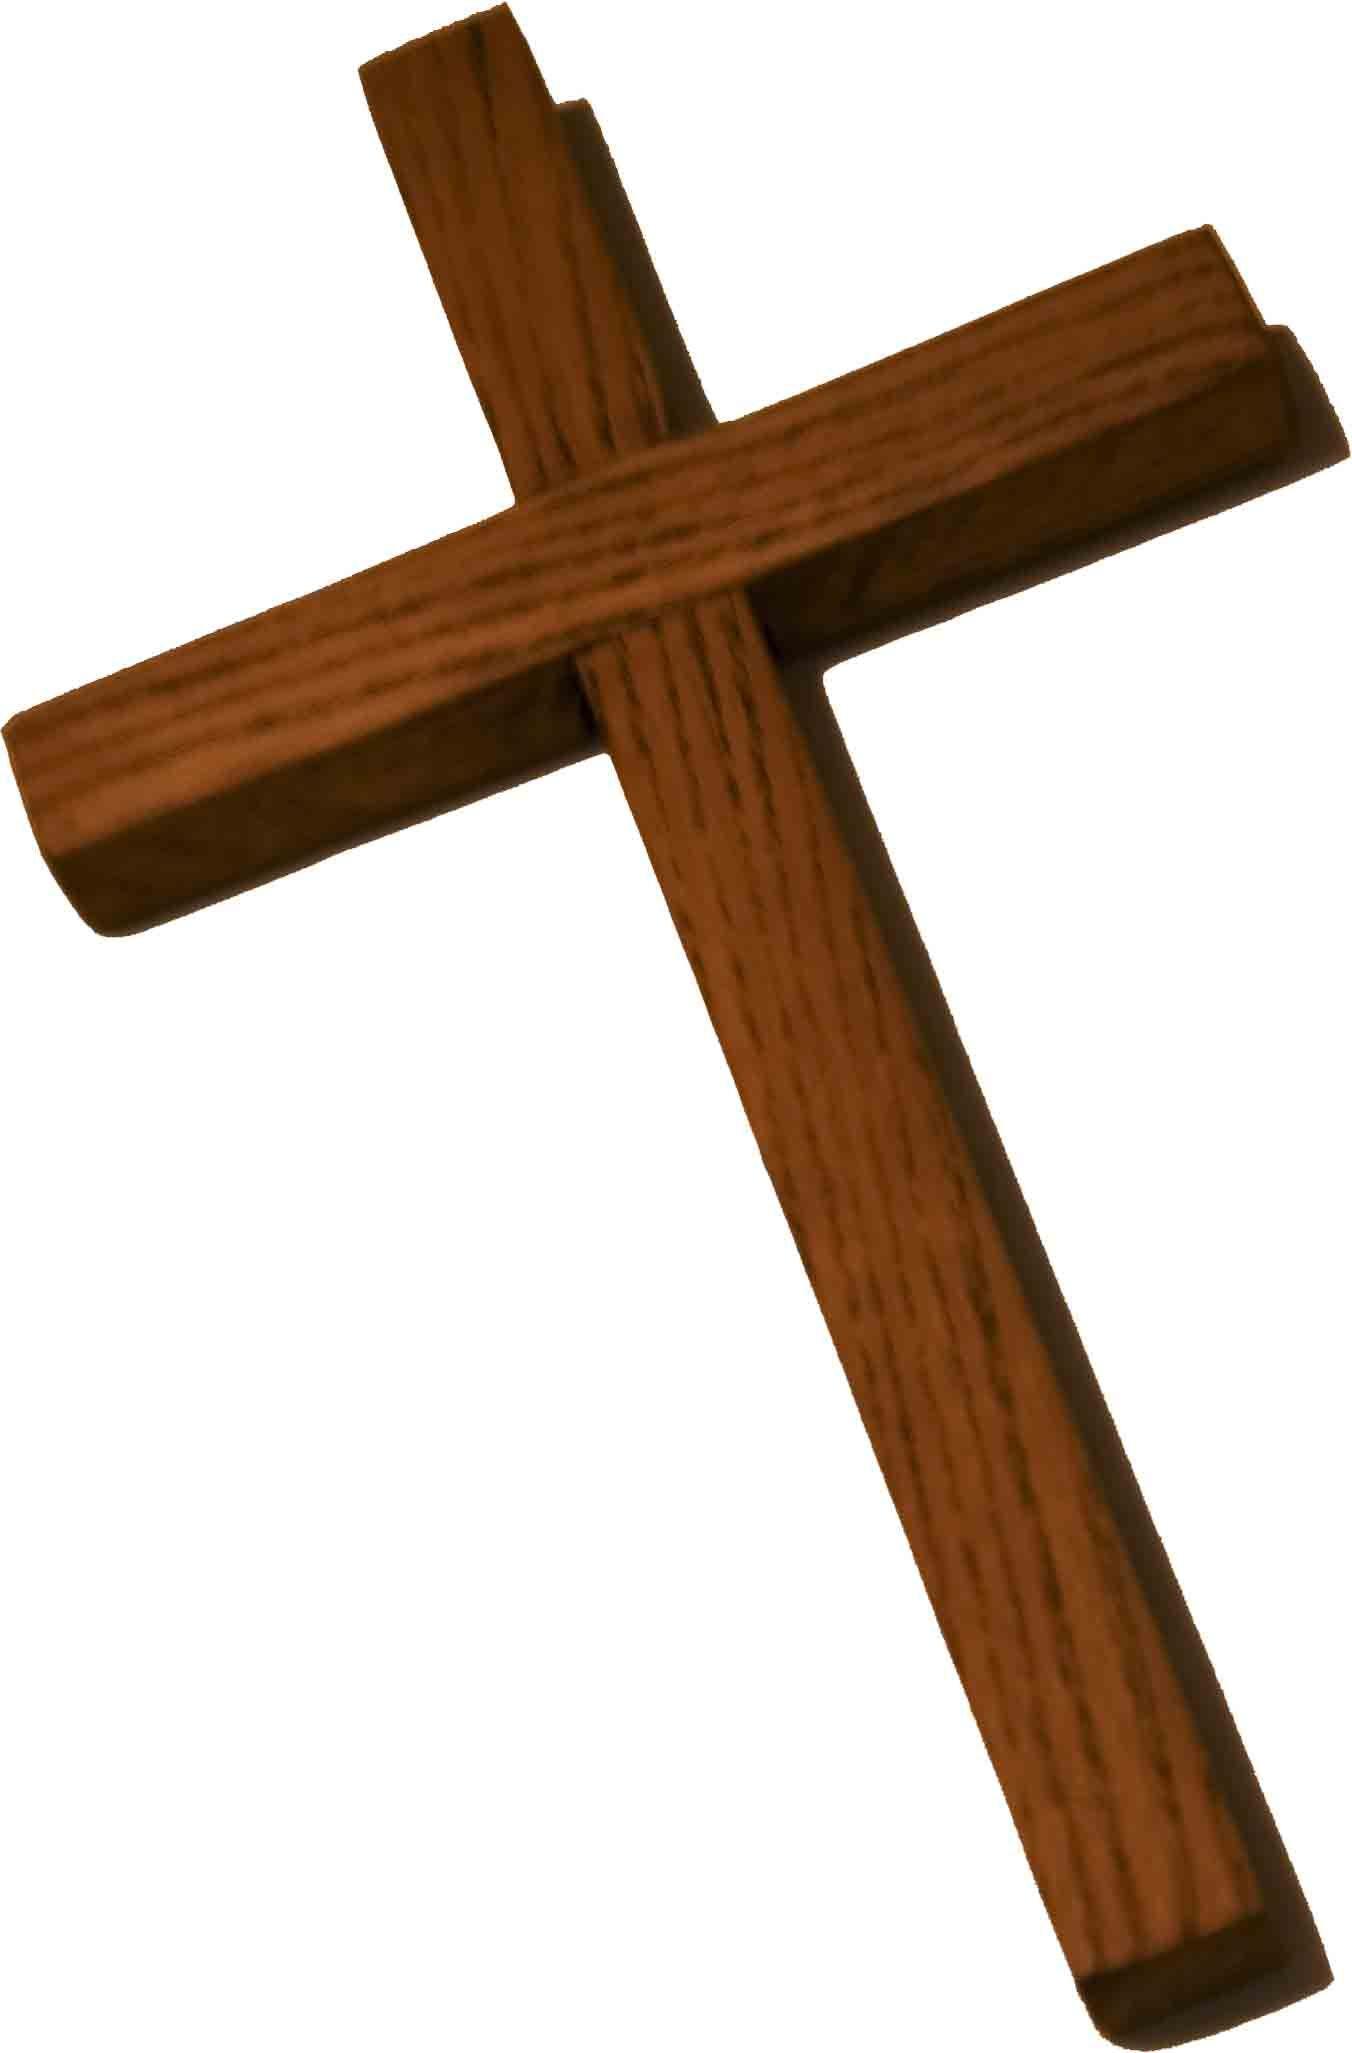 Clip art panda free. Crucifix clipart wooden cross